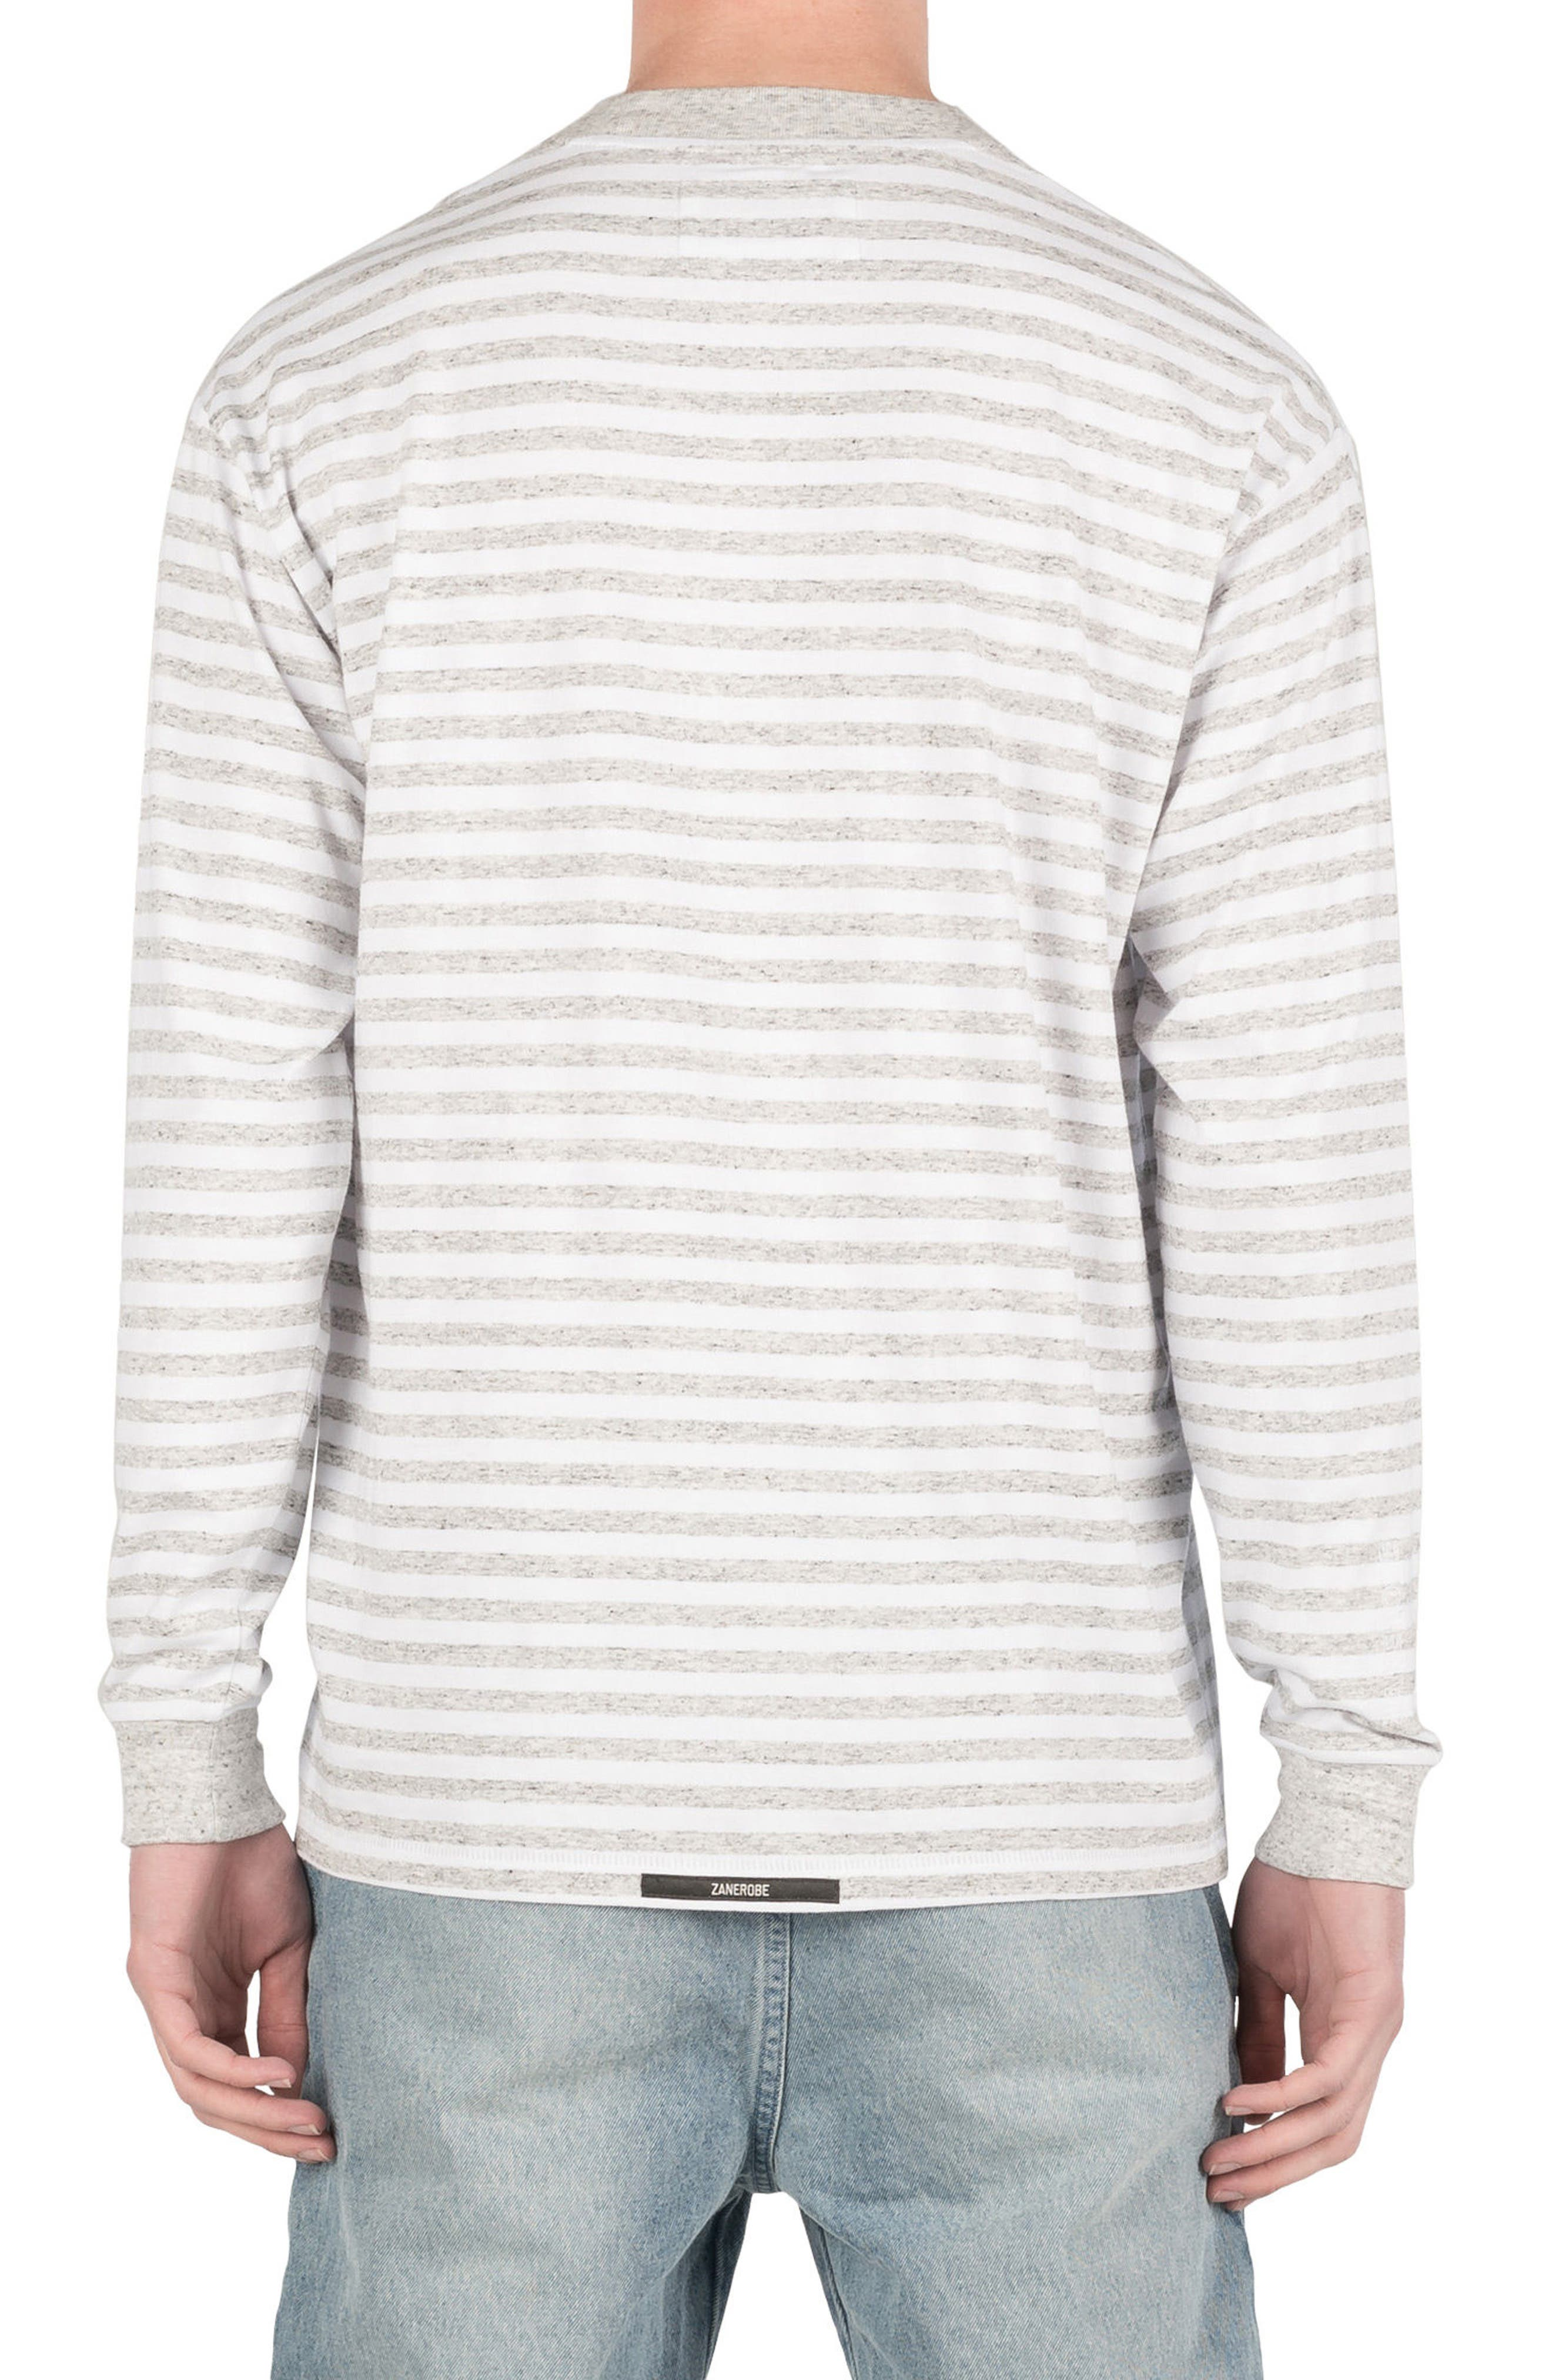 Box Long Sleeve T-Shirt,                             Alternate thumbnail 2, color,                             White/ Storm Marle